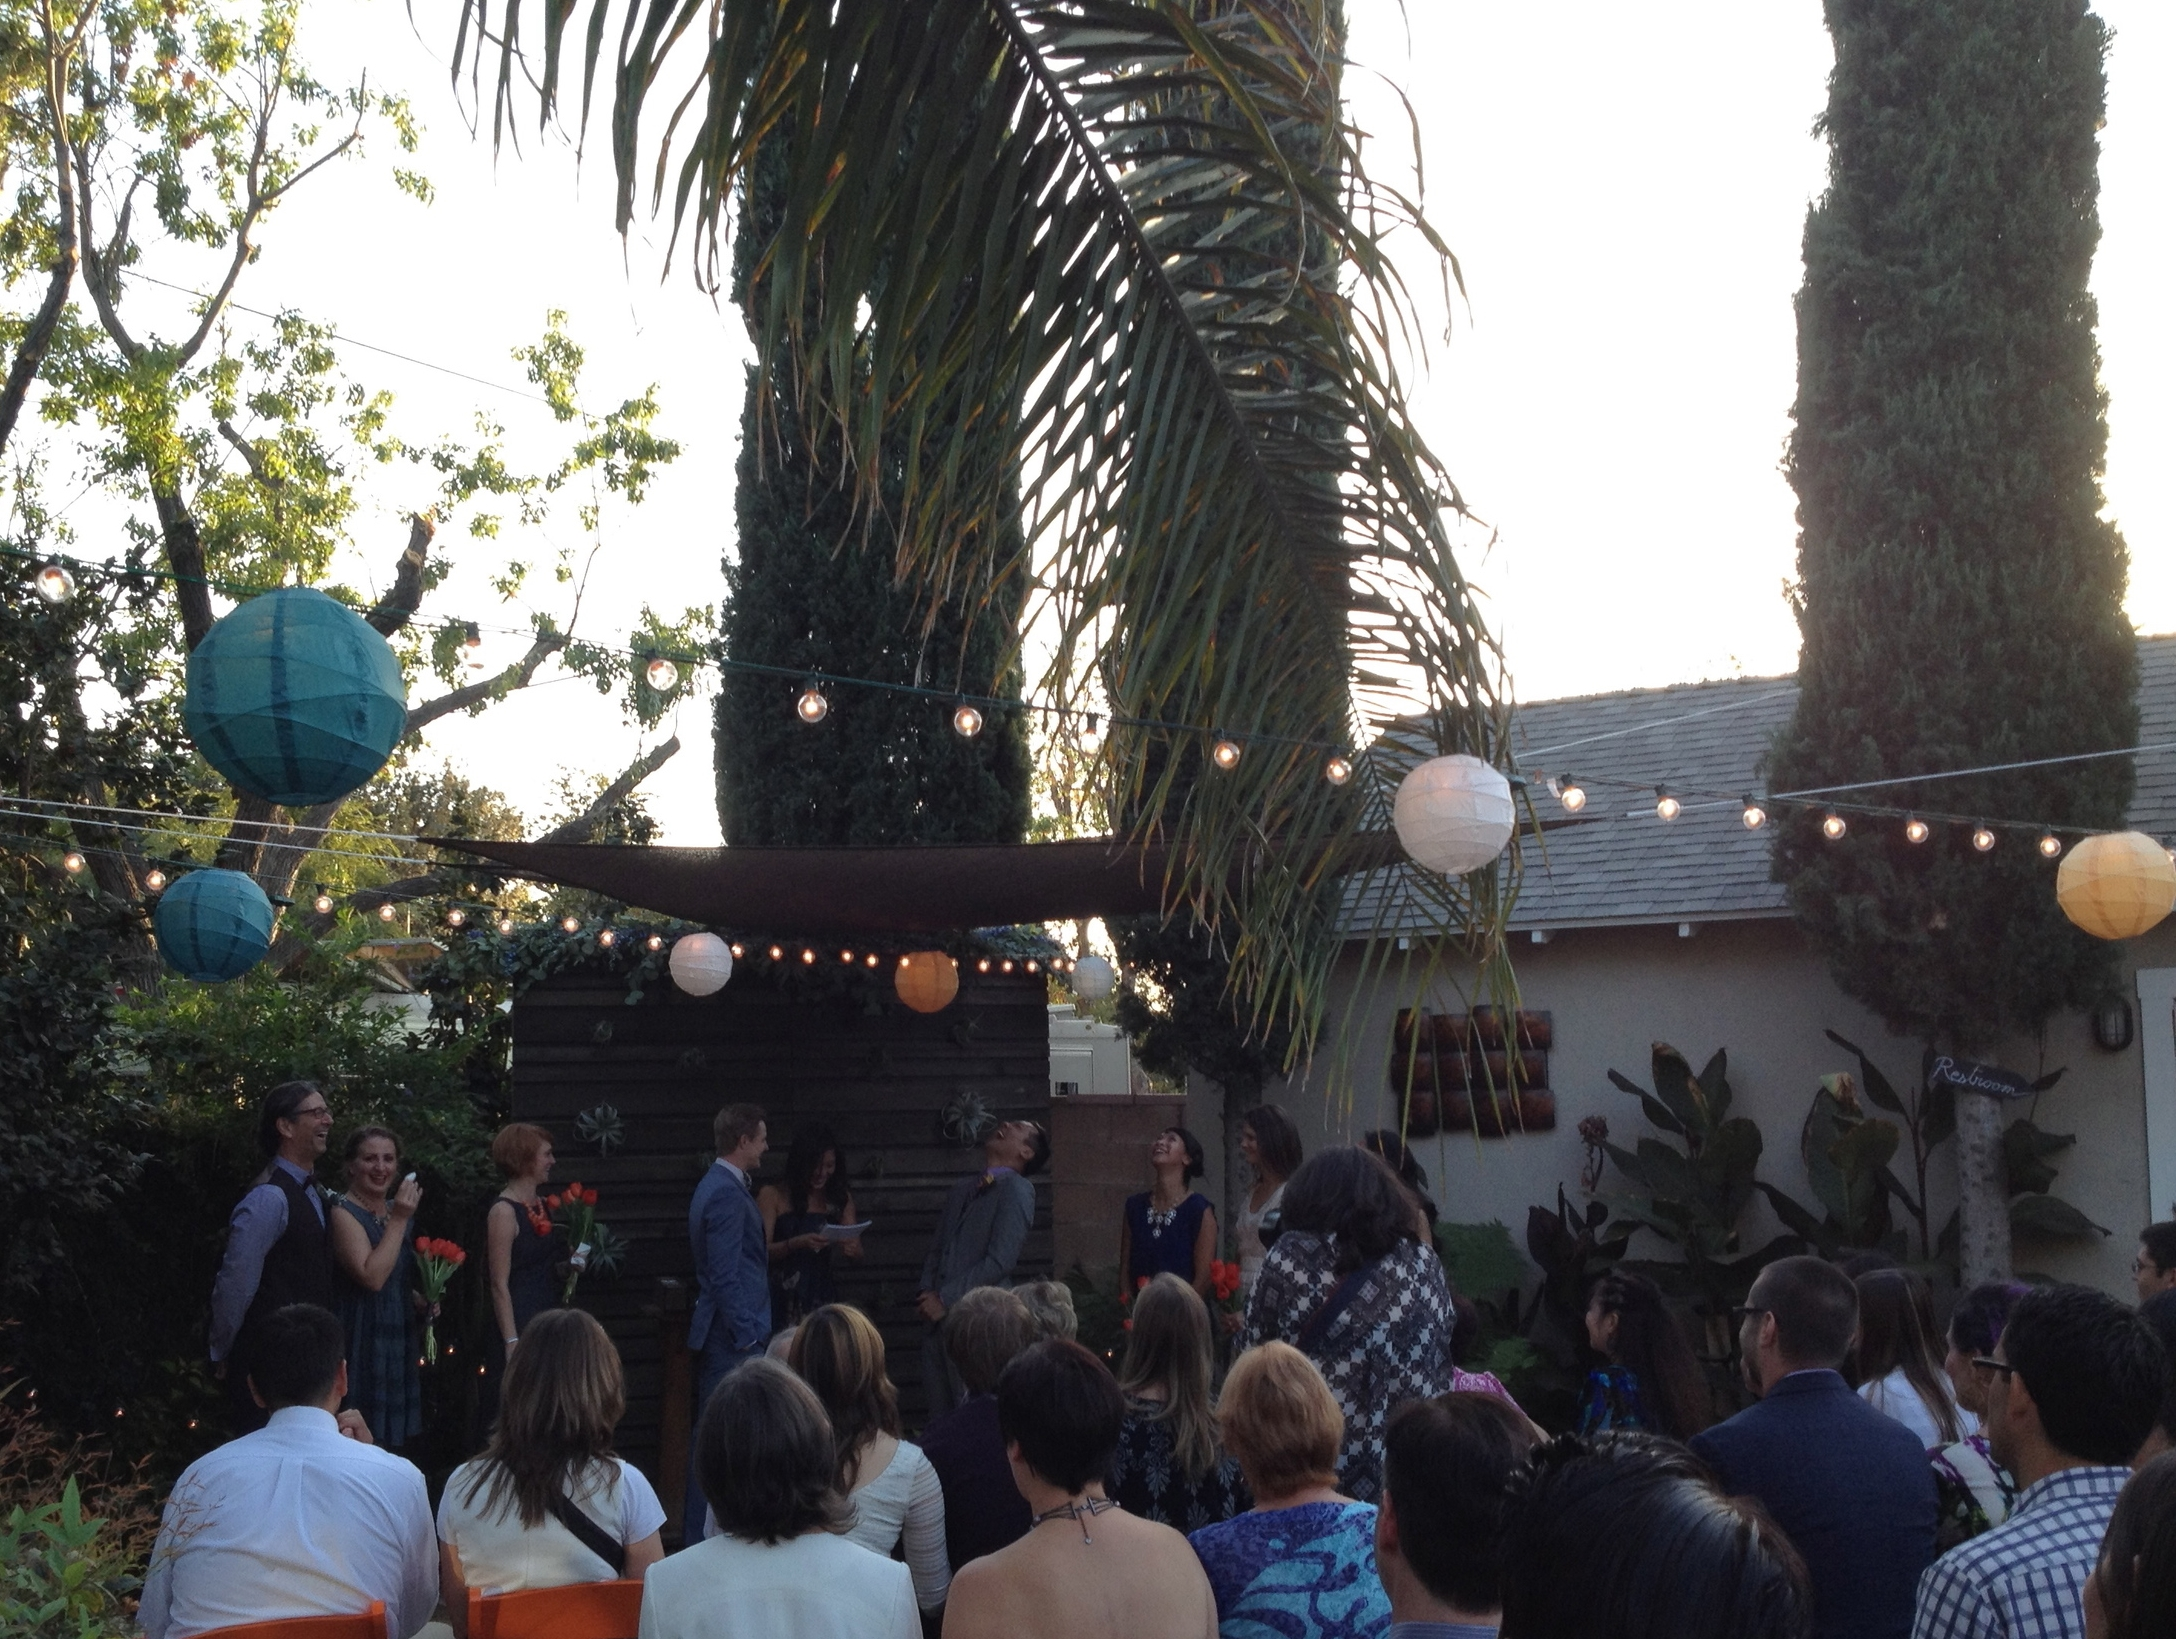 Backyard wedded bliss Van Nuys, CA